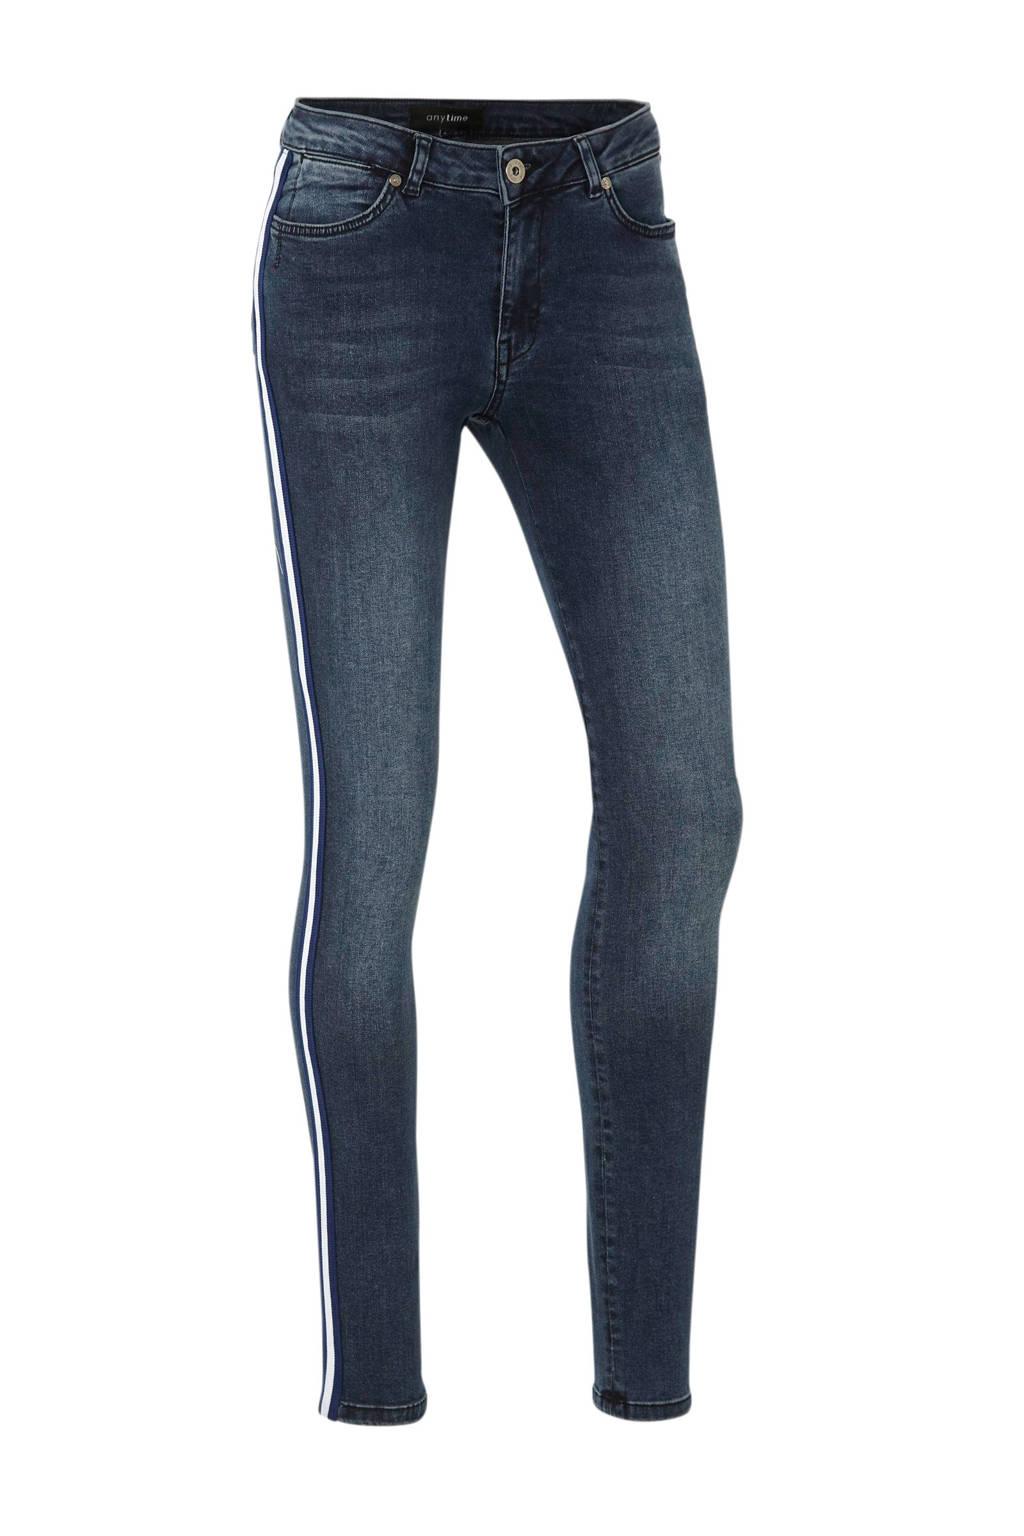 anytime super comfort basic skinny jeans met zijnaadbies, Dark blue stonewashed